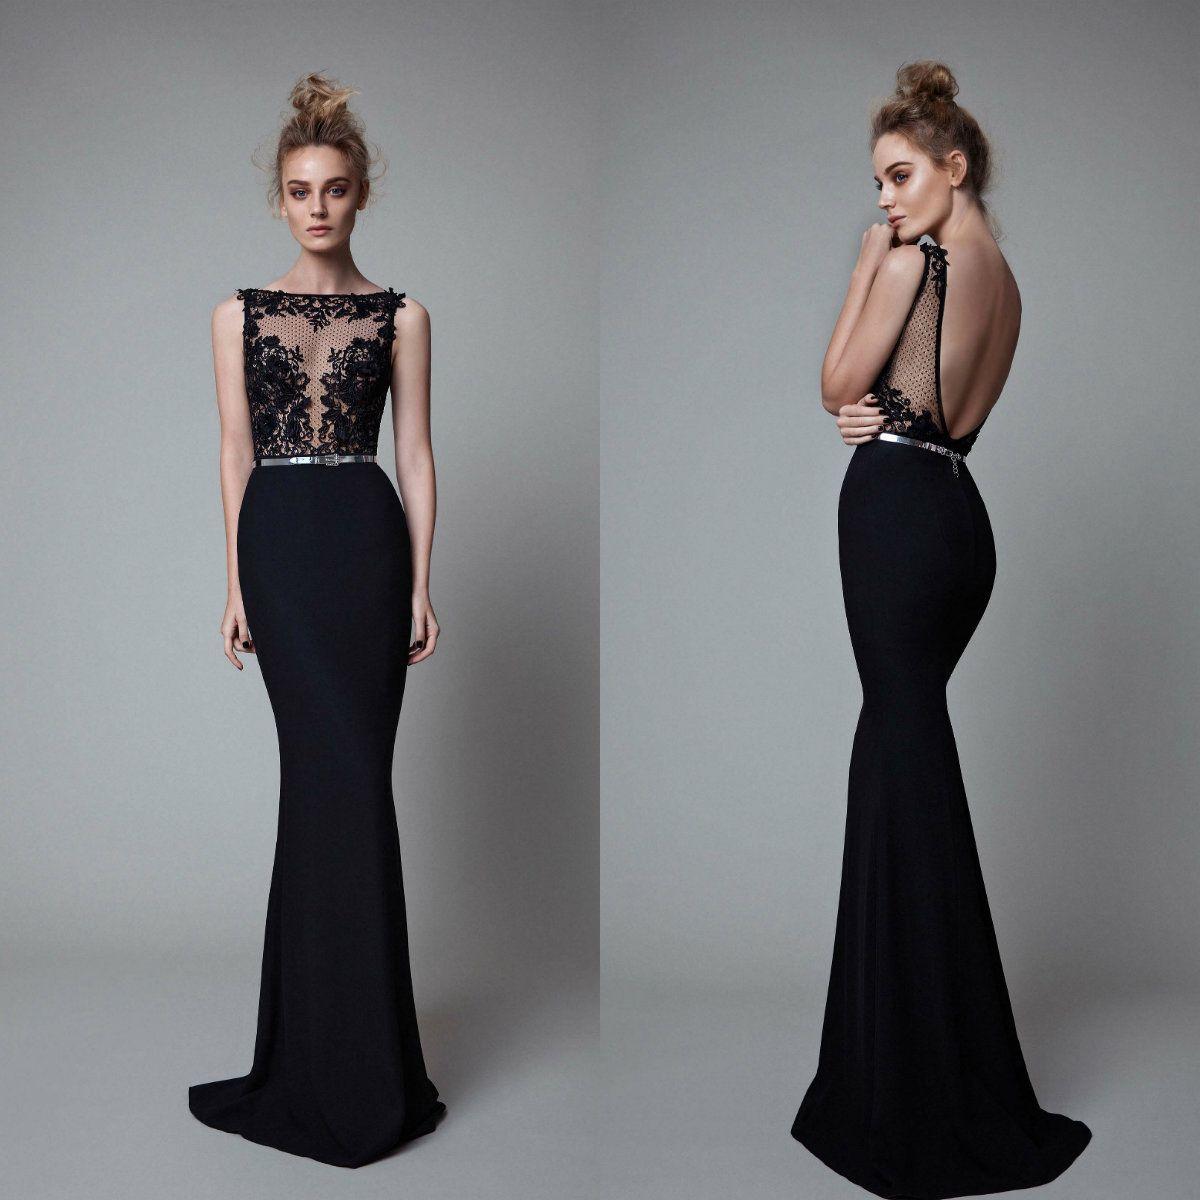 Black Lace Prom Dress Cream